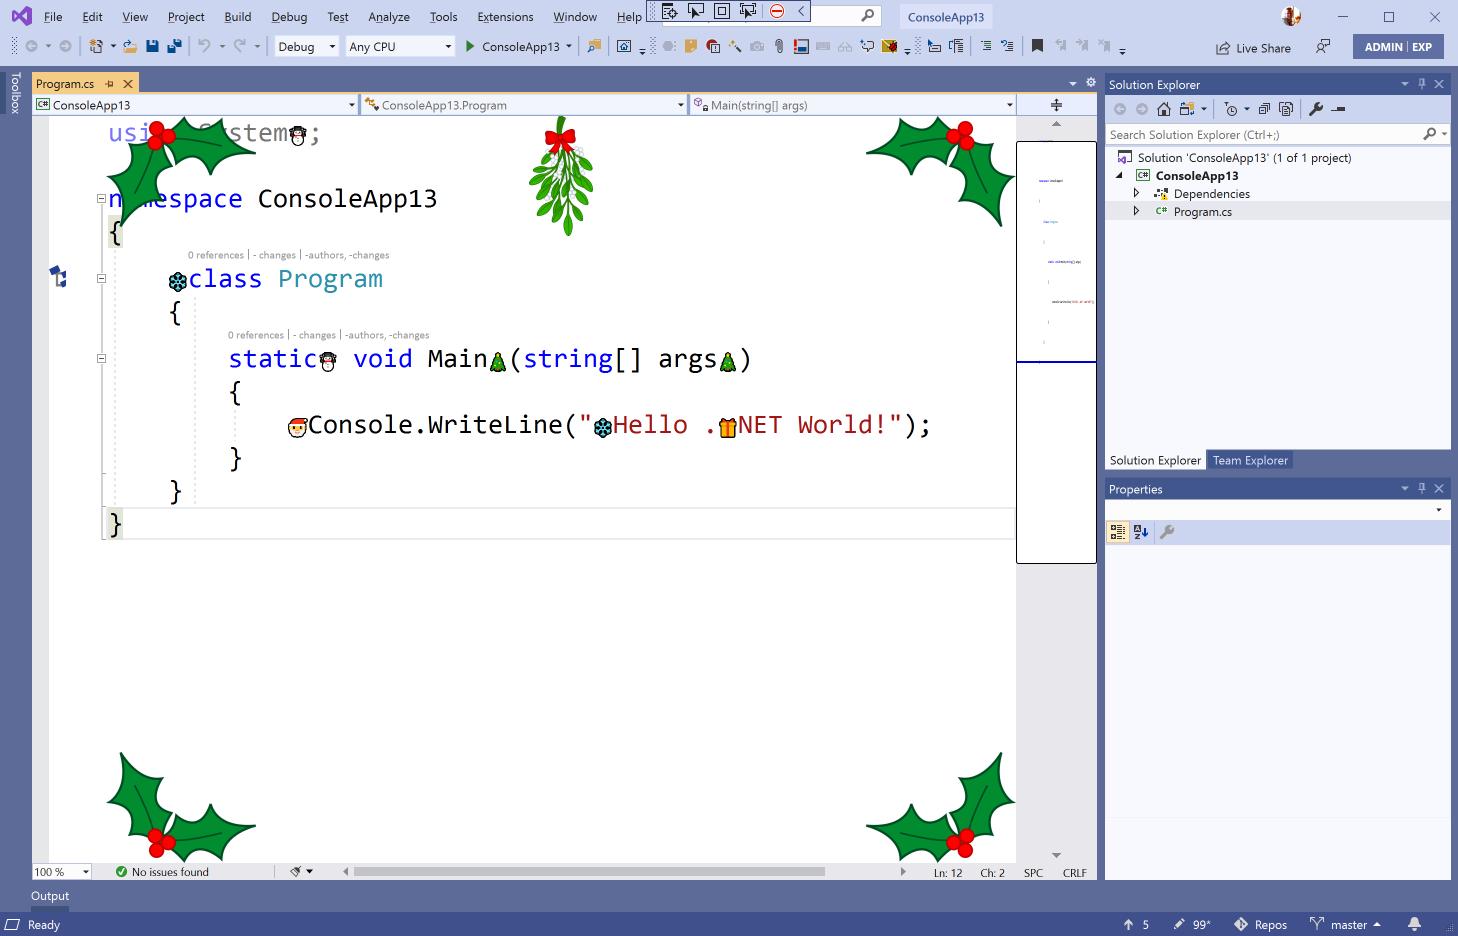 screenshot of Visual Studio editor including festive adornments